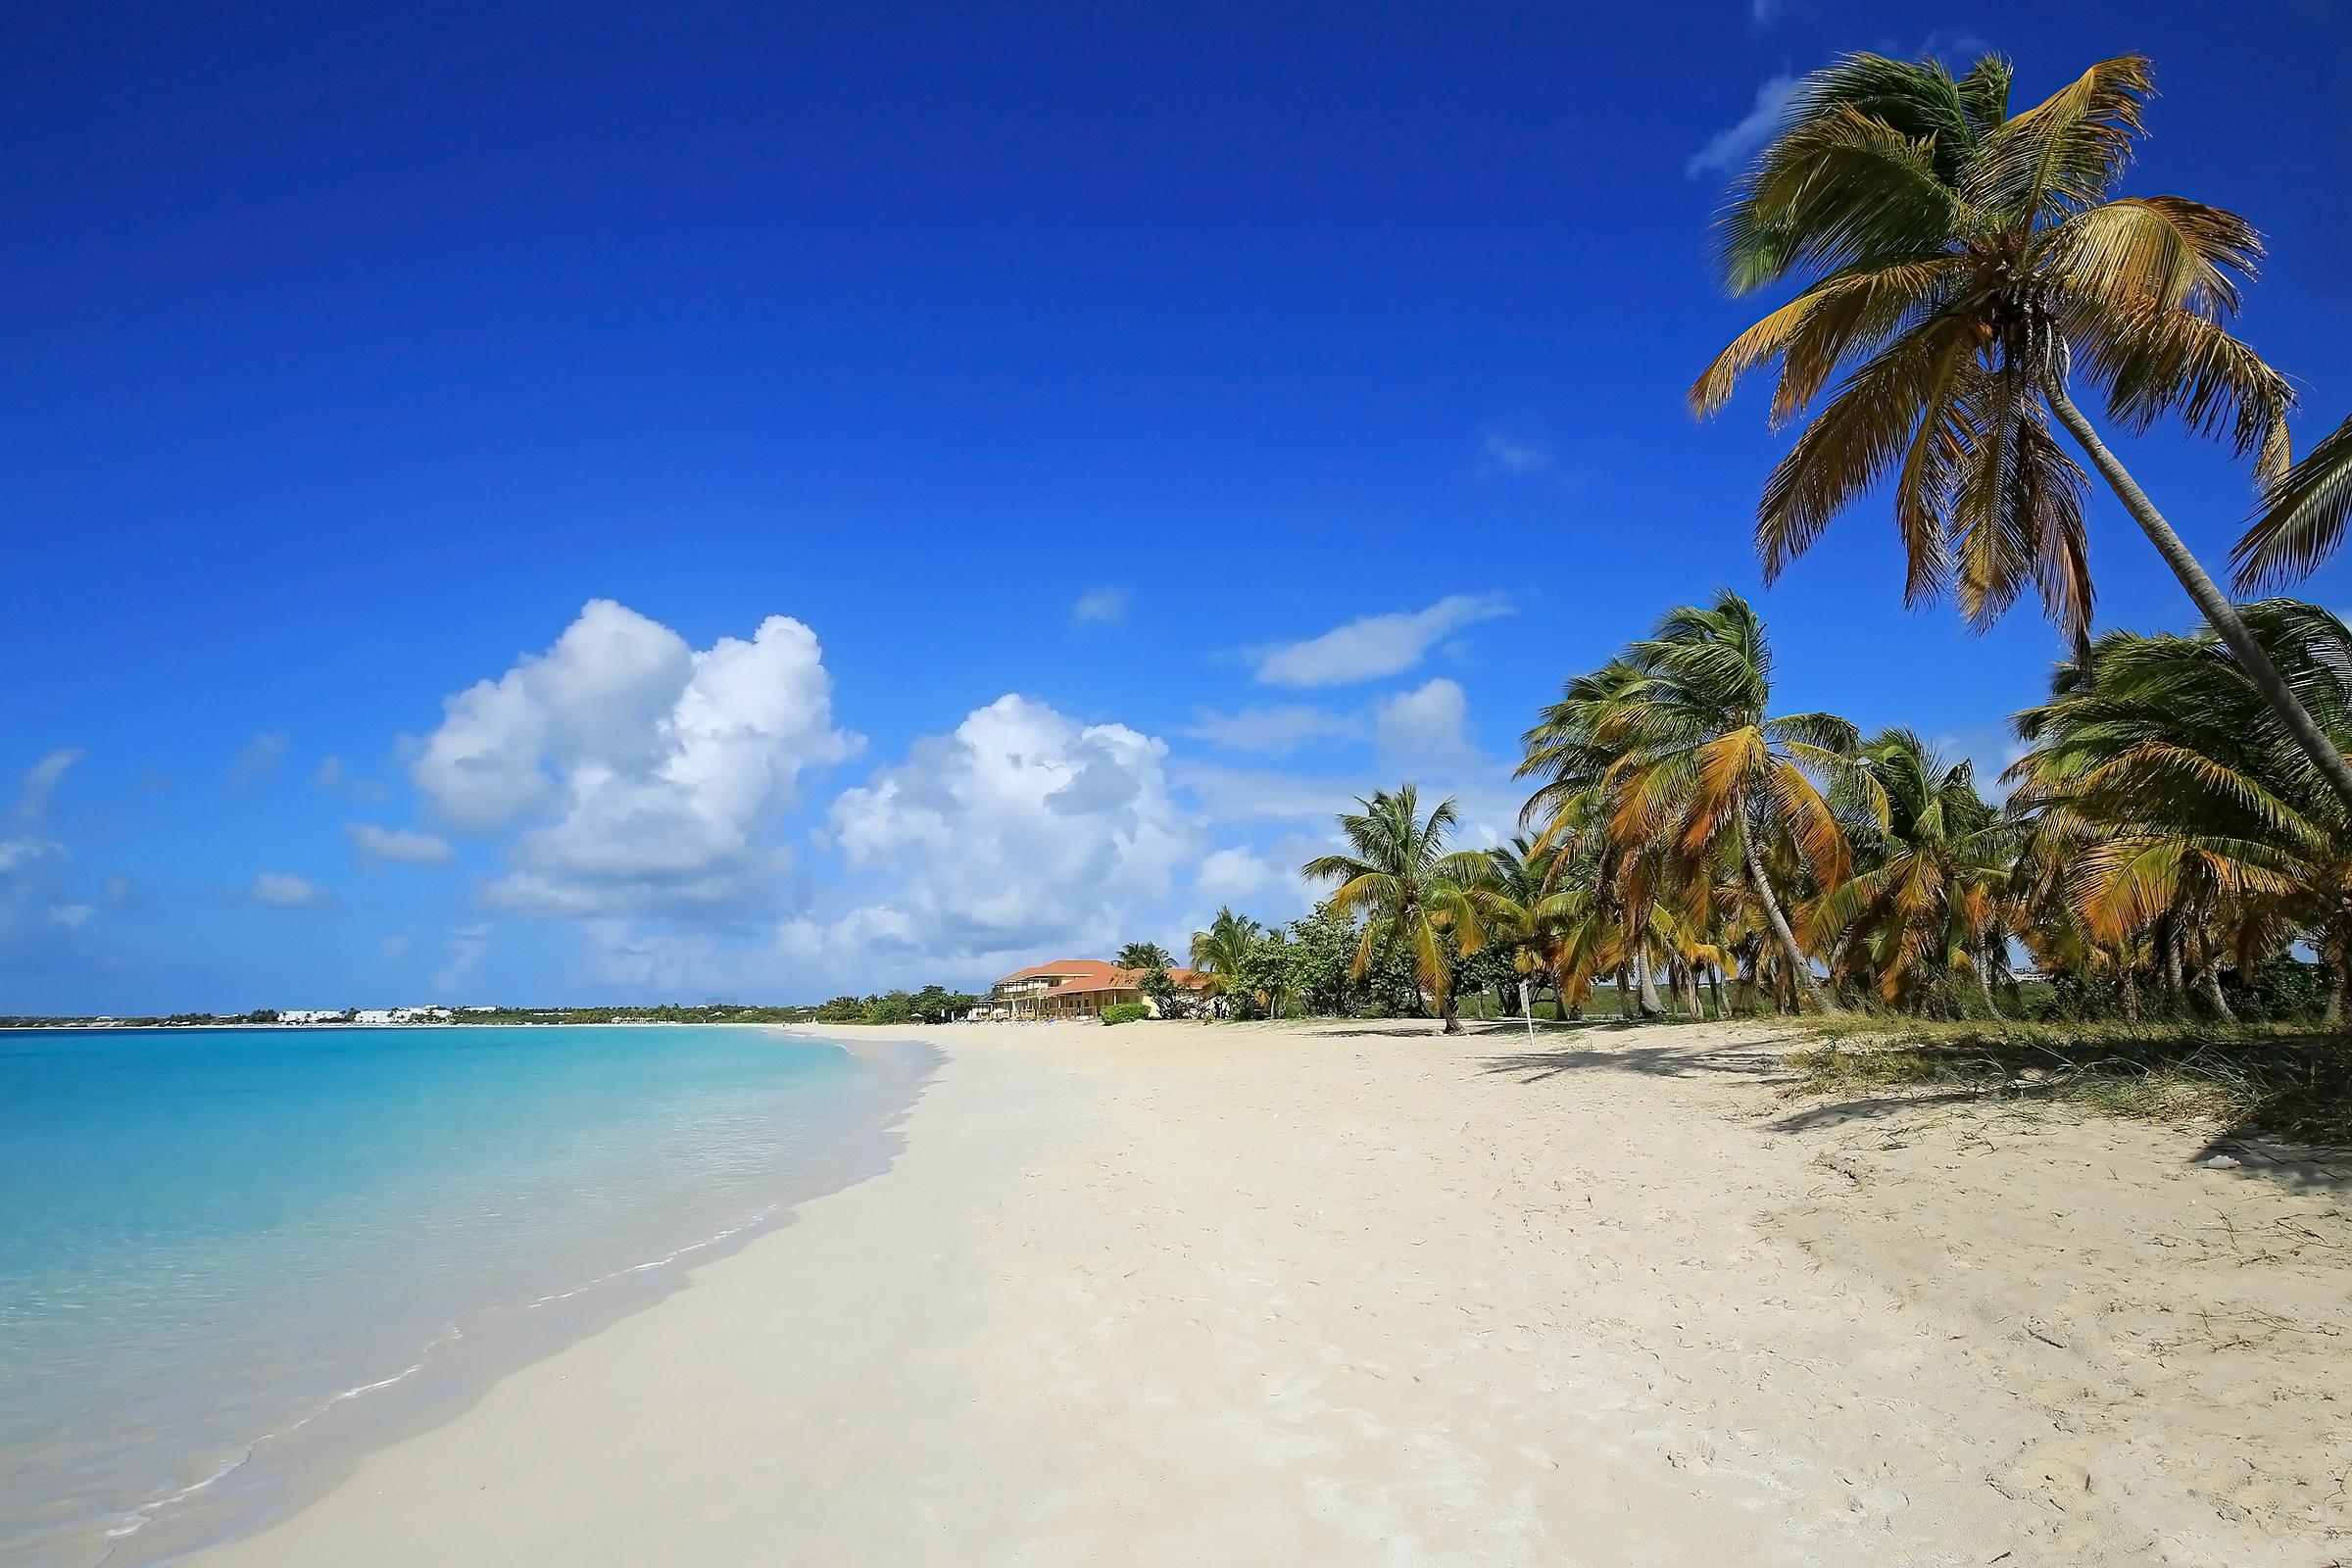 Paradise beach - Rendezvous Bay Anguilla...